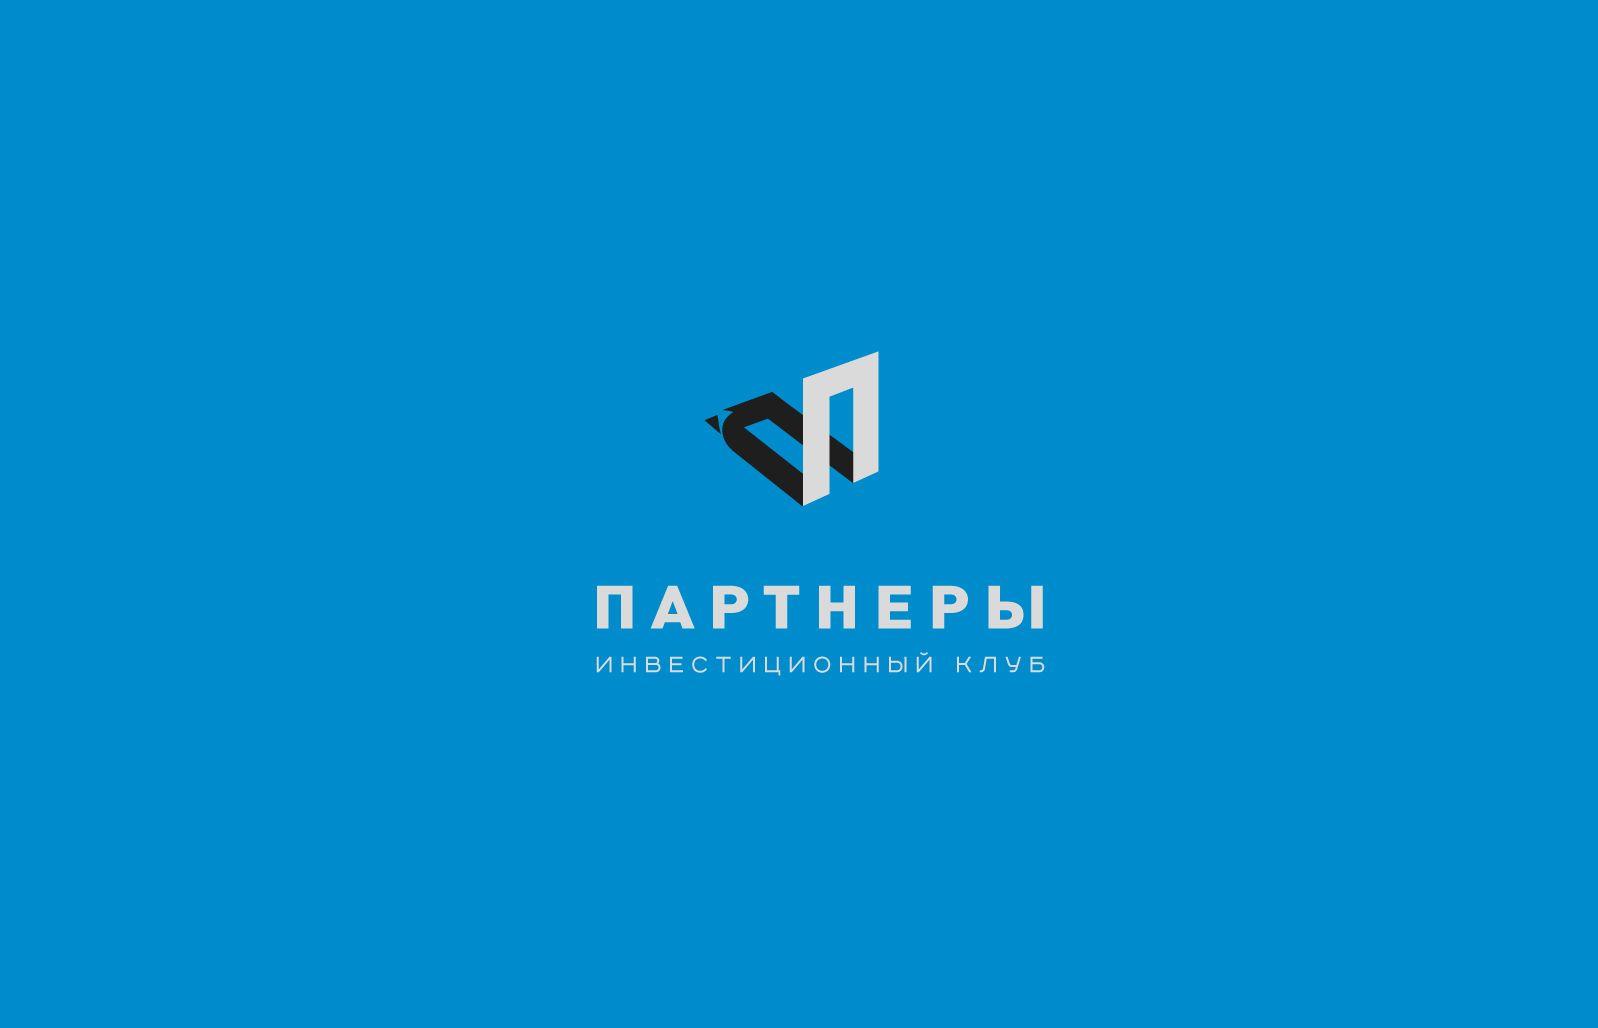 Логотип для Инвестиционный клуб